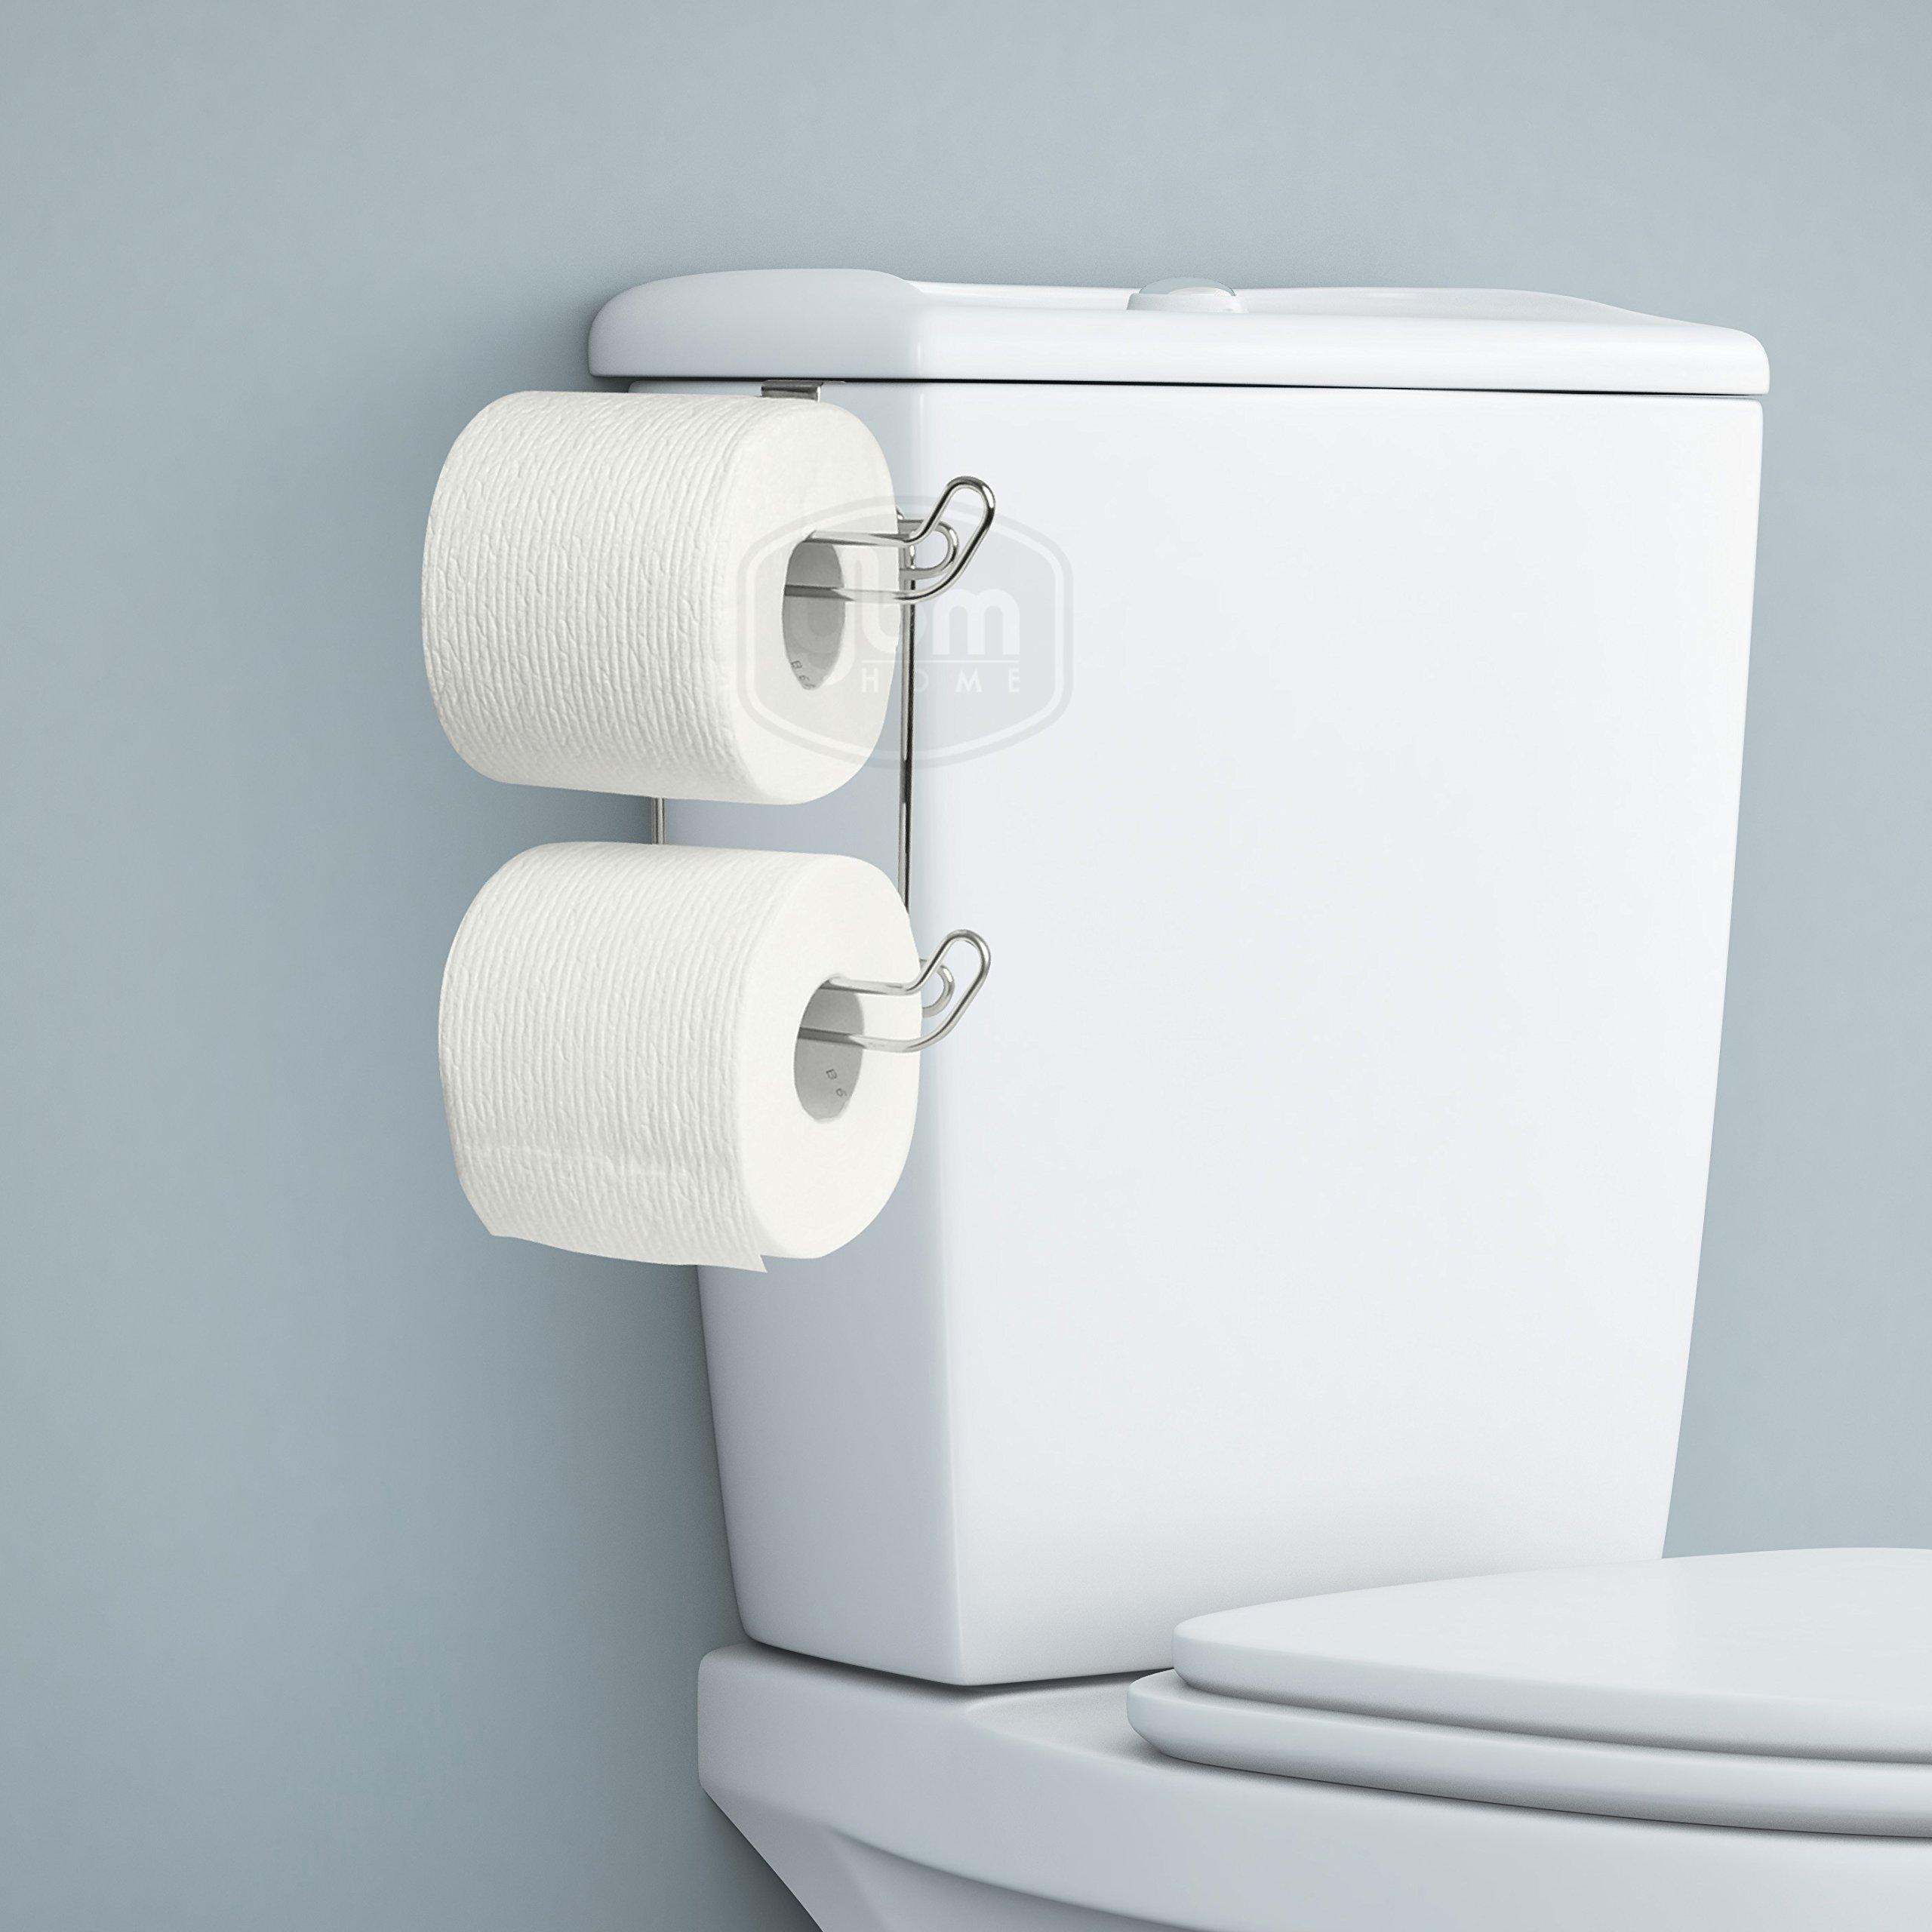 Cheap Bathroom Tank, find Bathroom Tank deals on line at Alibaba.com